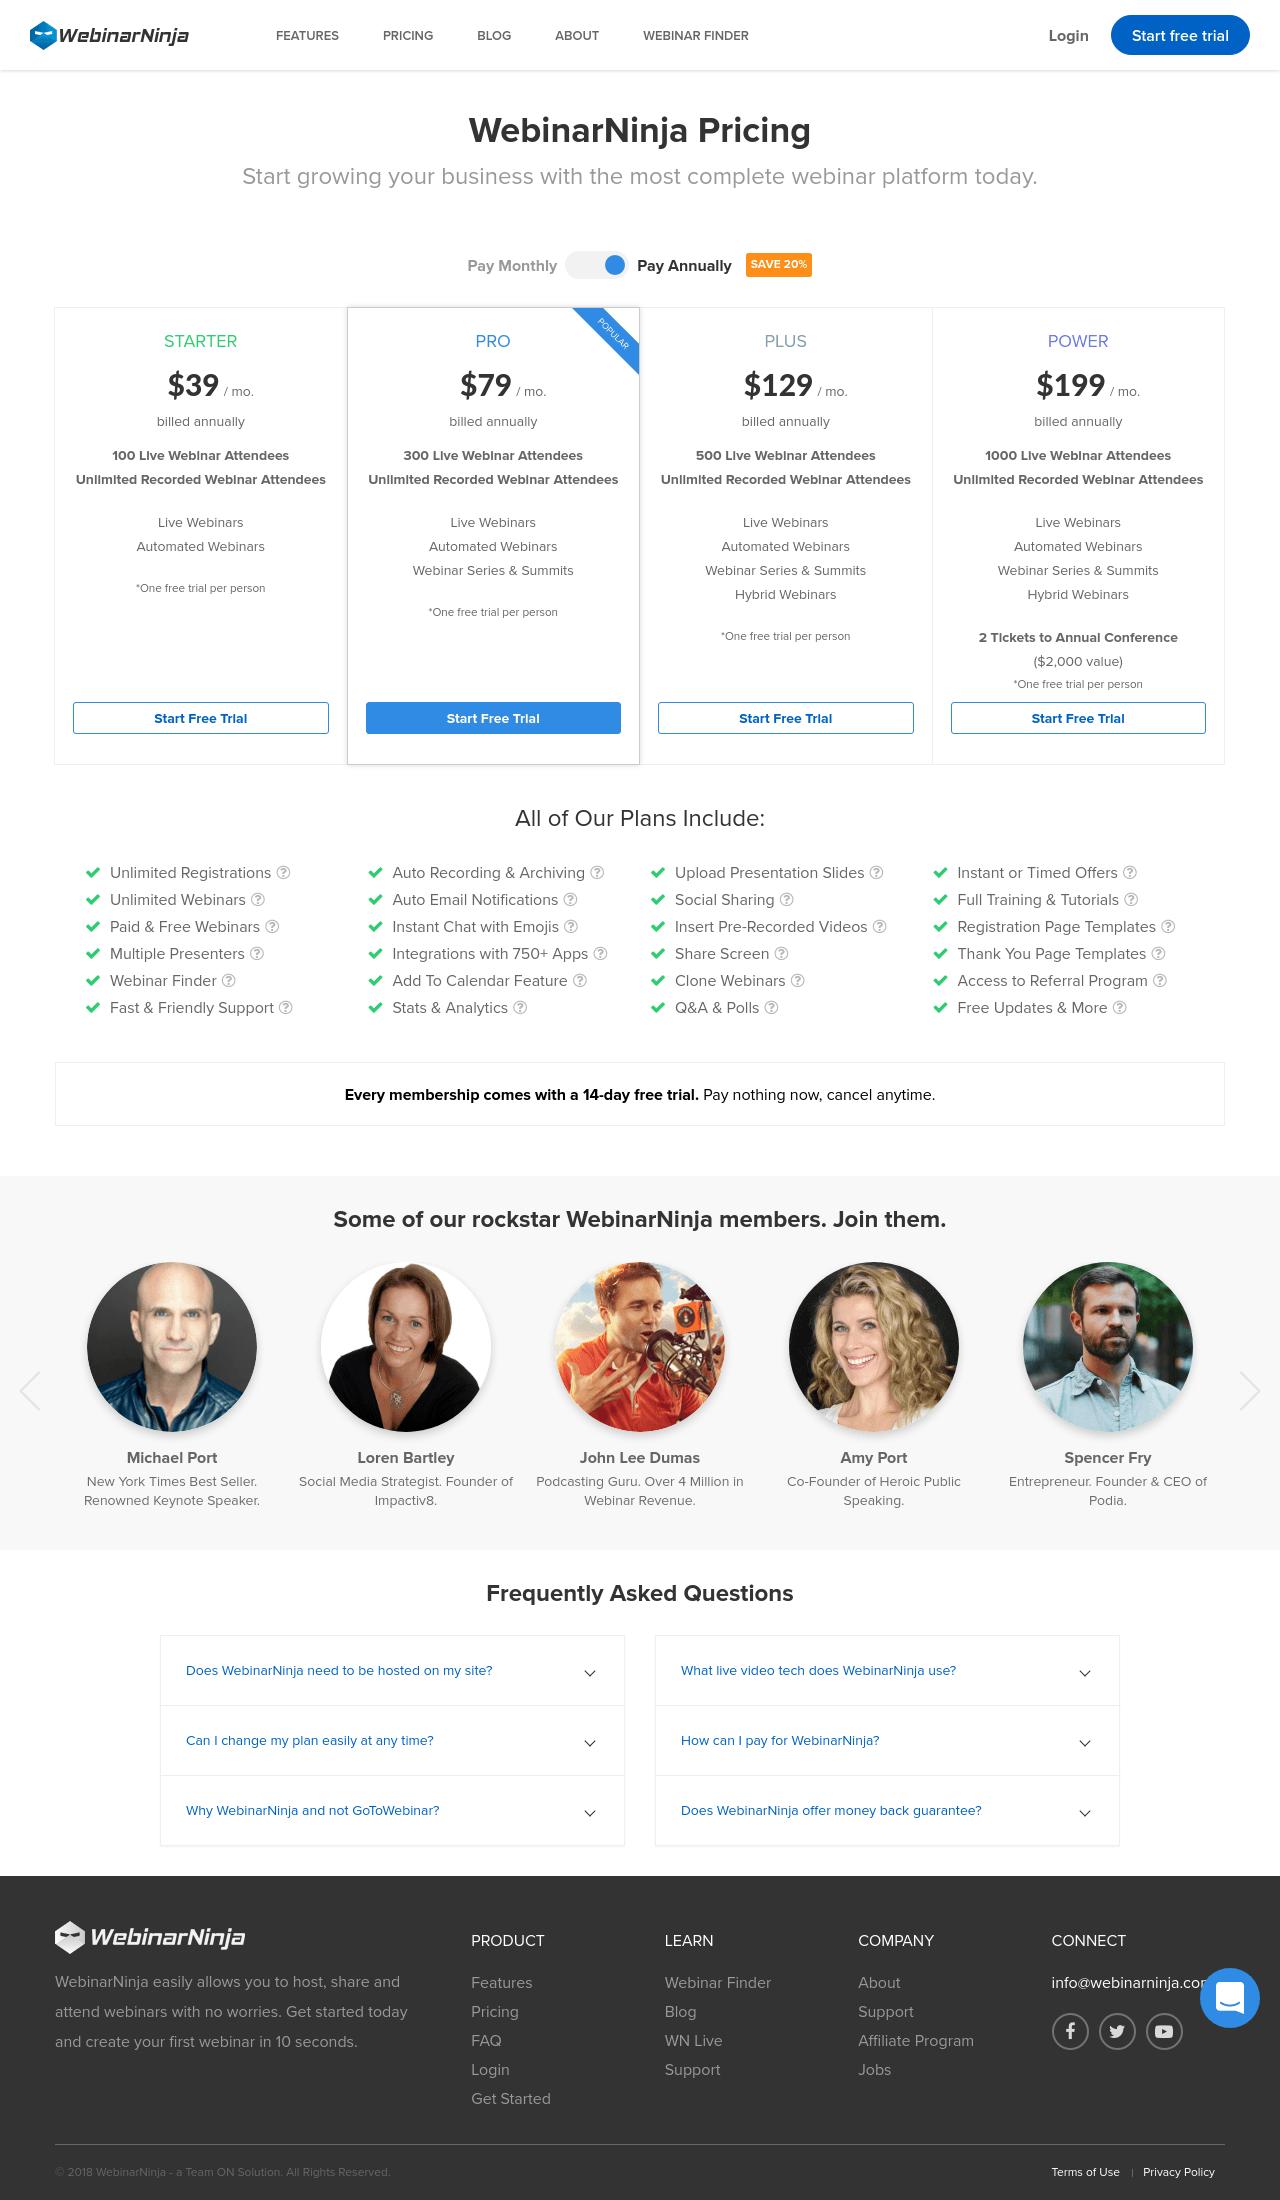 httpsmy.webinarninja.complans